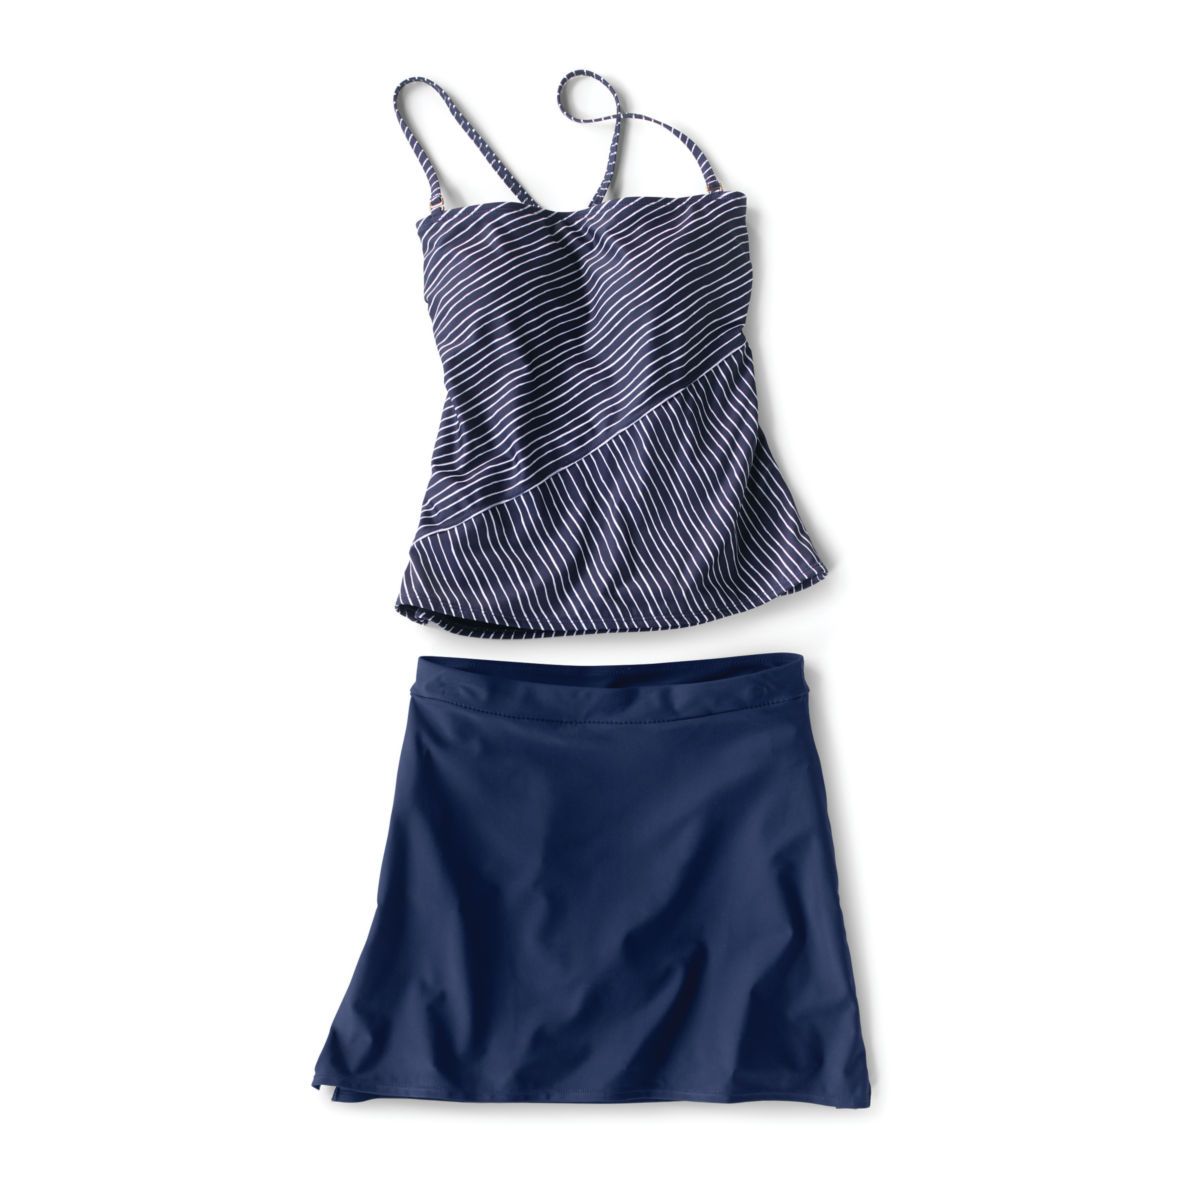 Mid-Thigh Swim Skirt - Nautical Stripe Tankini - NAVY STRIPEimage number 0